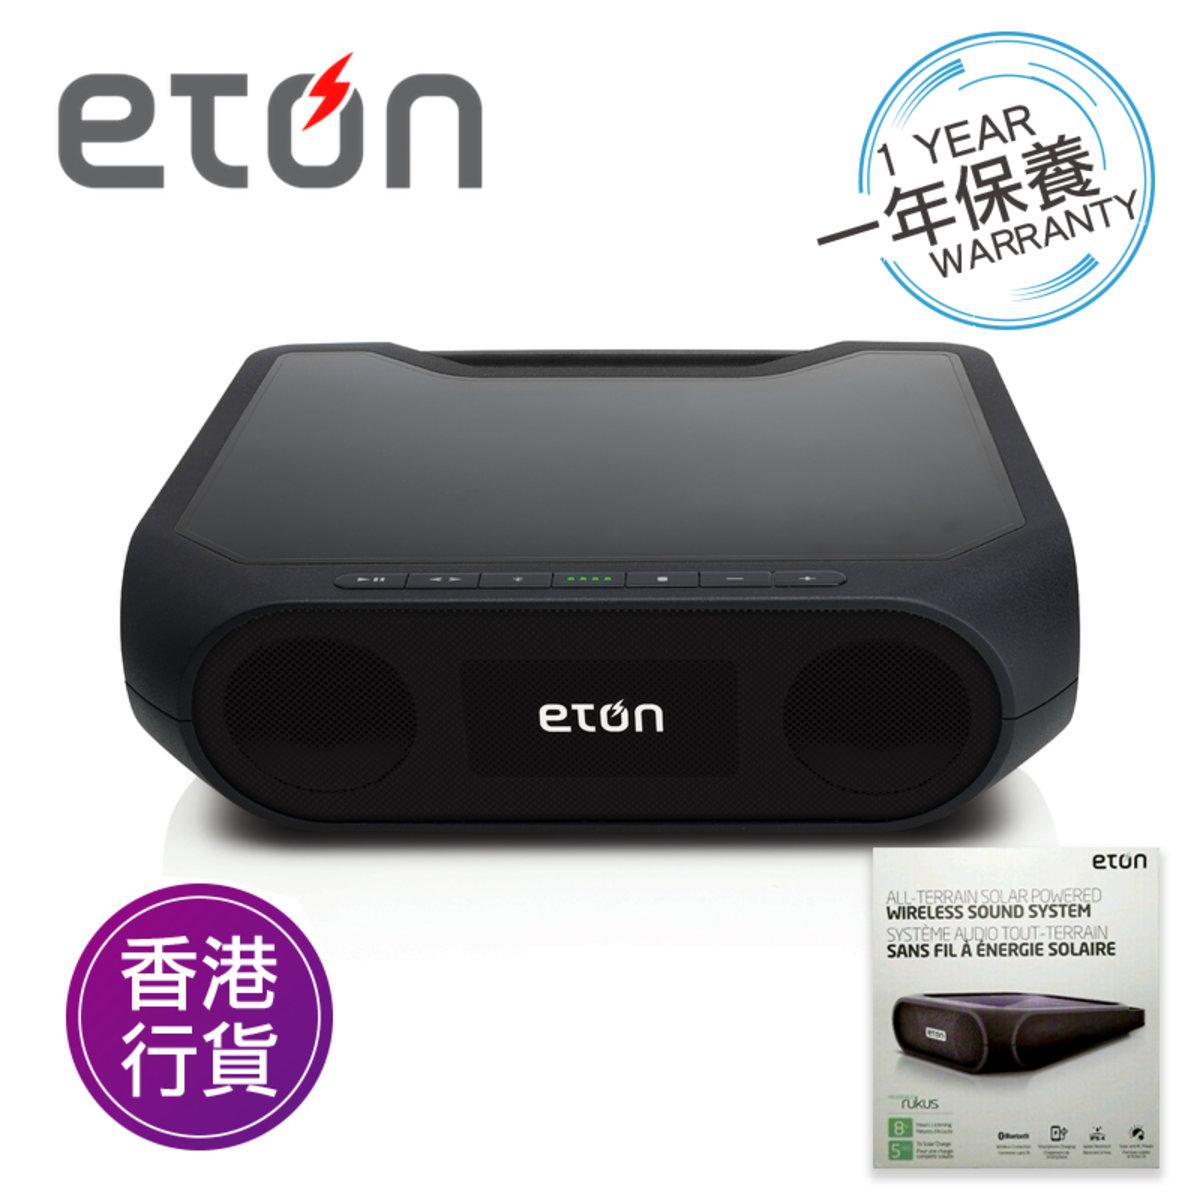 ETON RUKUS XTREME ALL-TERRAIN SOLAR POWERED CHARGING Bluetooth SPEAKER One Year Warranty